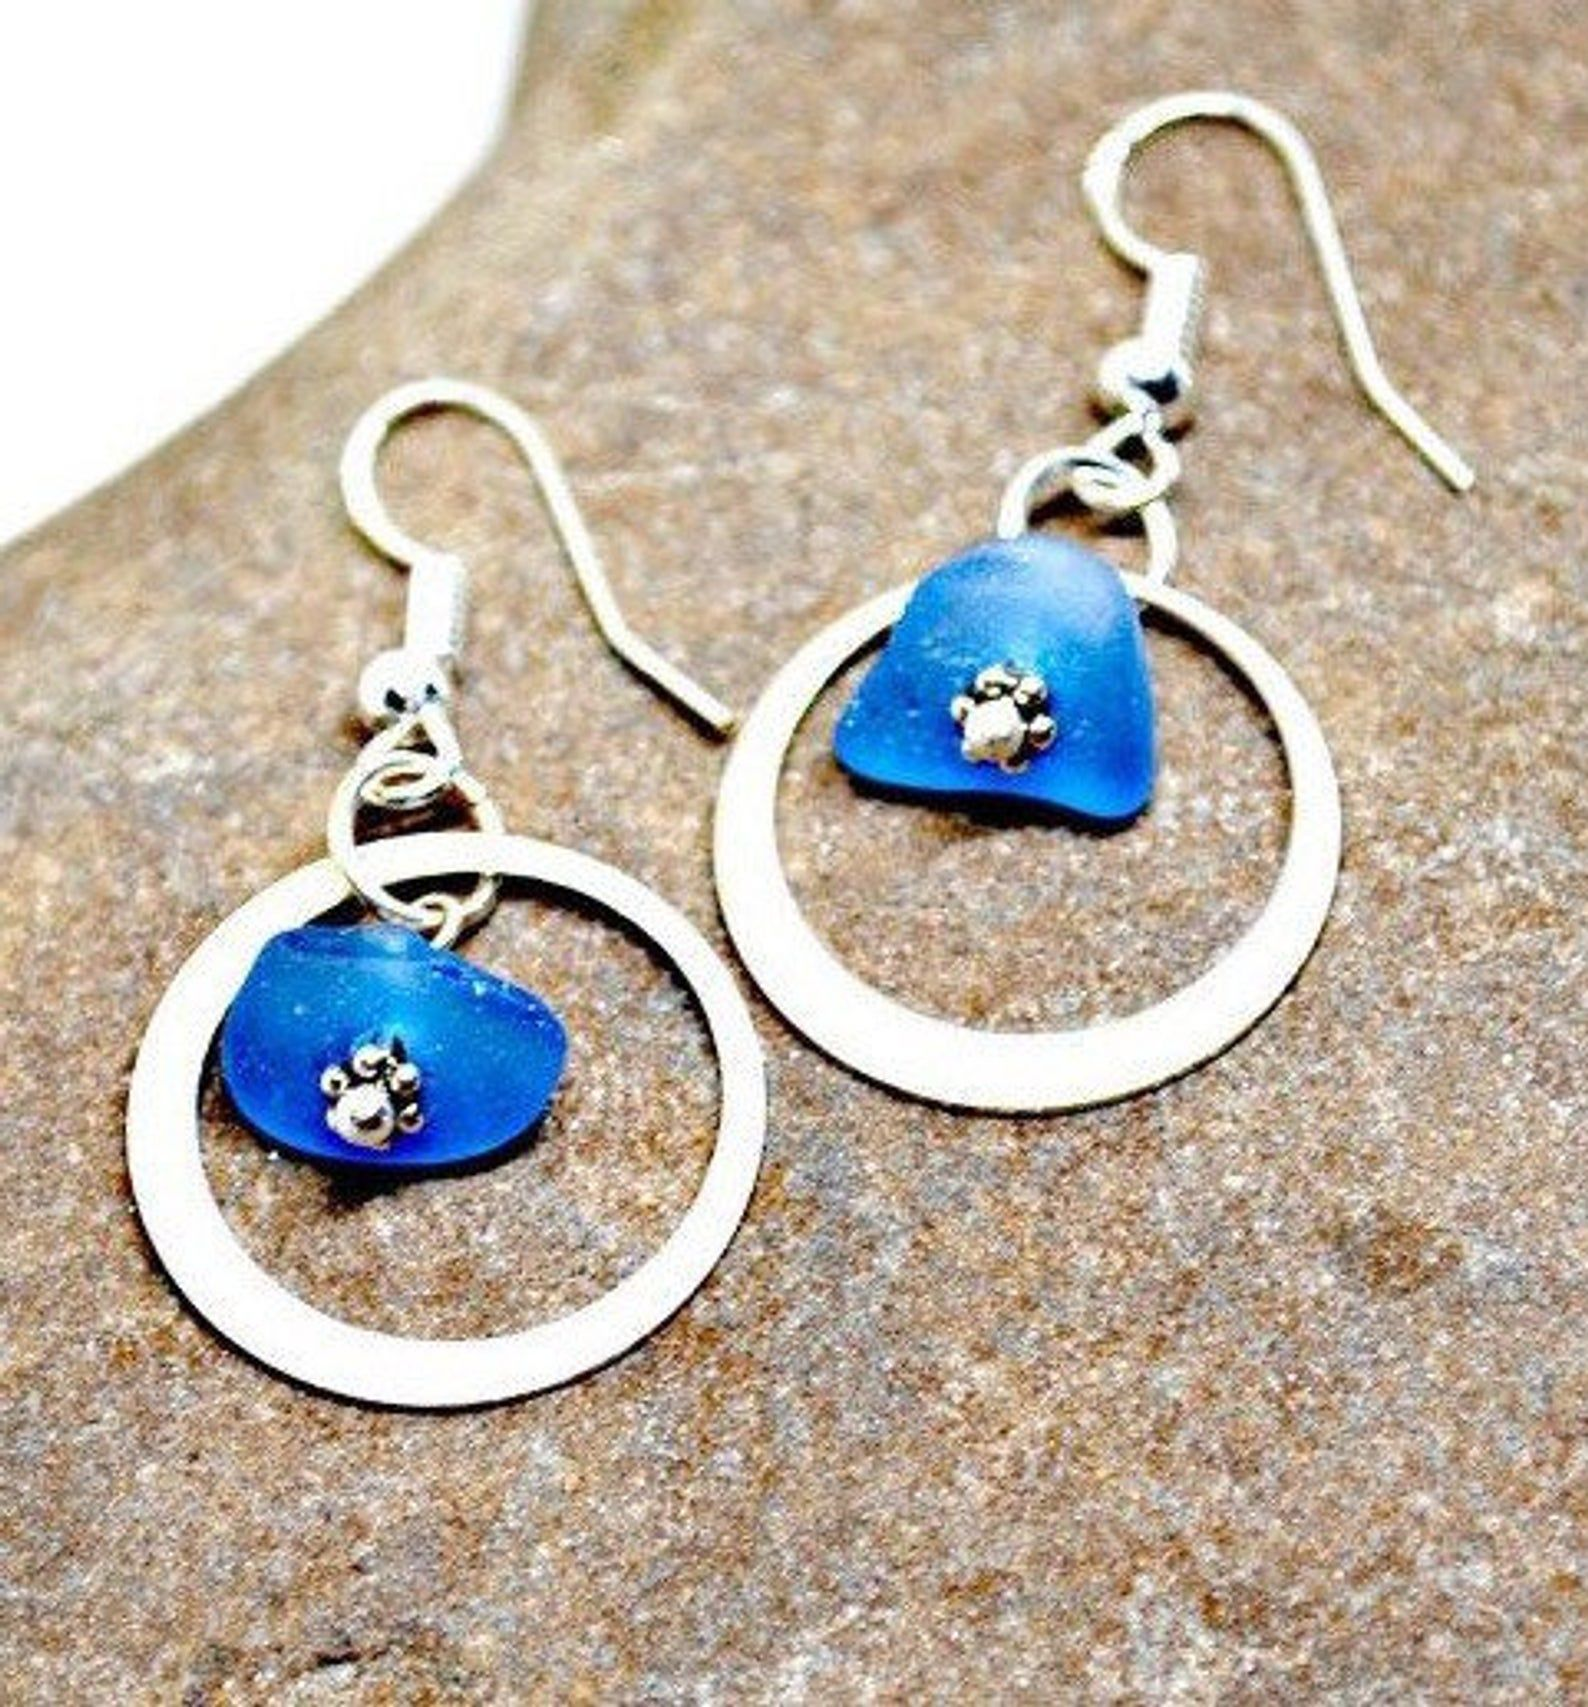 Beach Jewelry Beach Glass Earrings Beach Glass Jewelry Sea Glass Jewelry Beach Lovers Gift Blue Beach Earrings Blue Sea Glass Earrings